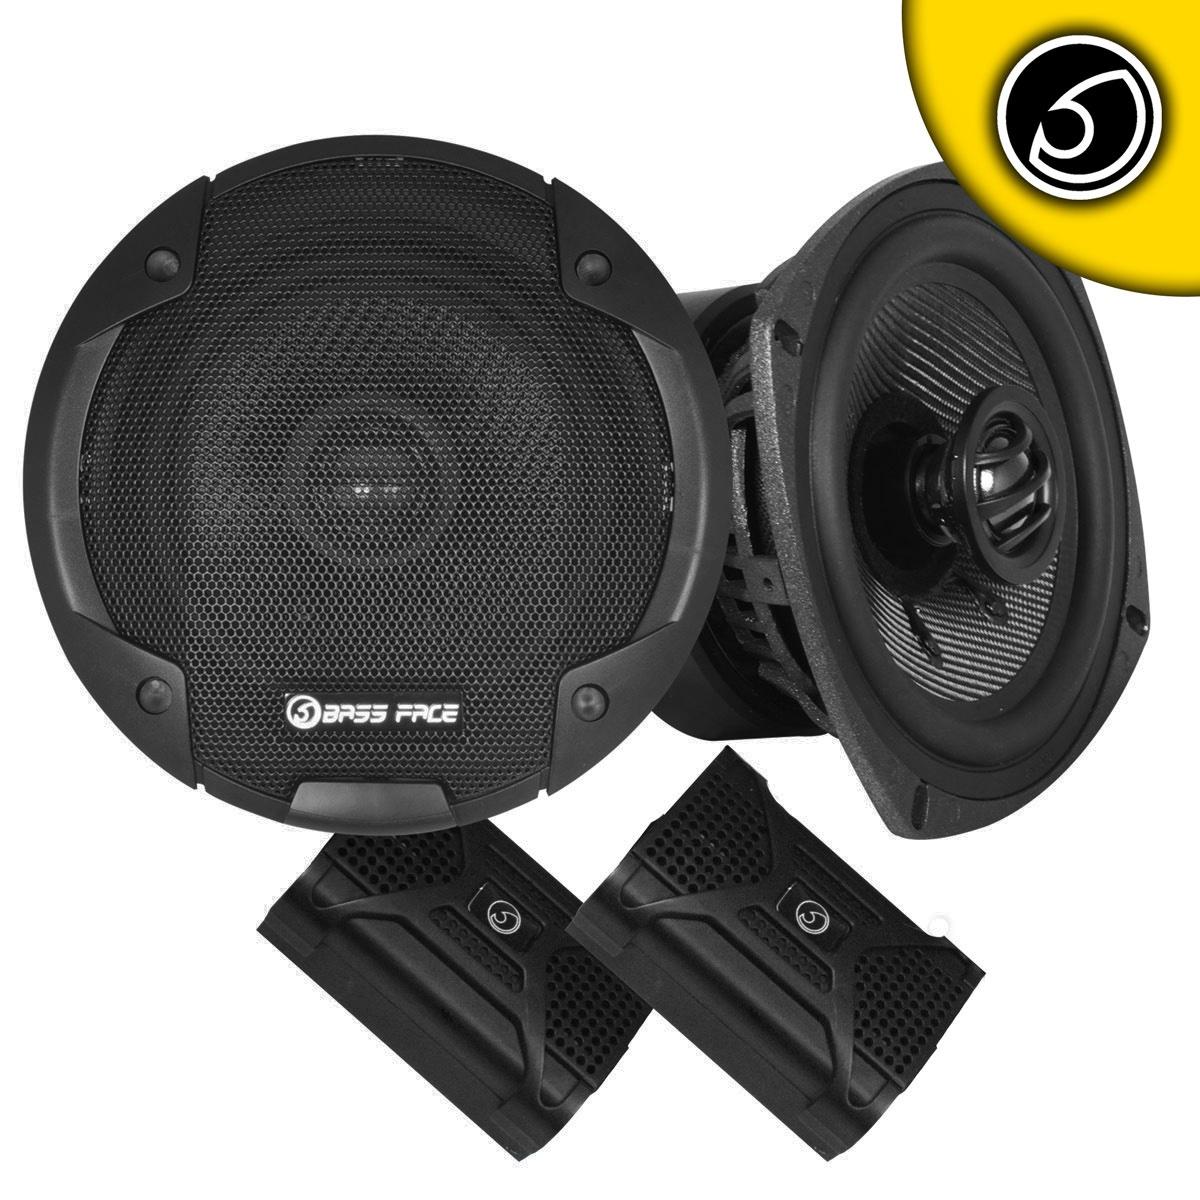 "Bassface BLACKSPL5.1 640w 5.25"" Inch 13cm 4Ohm Coaxial 2 Way Speaker Pair"